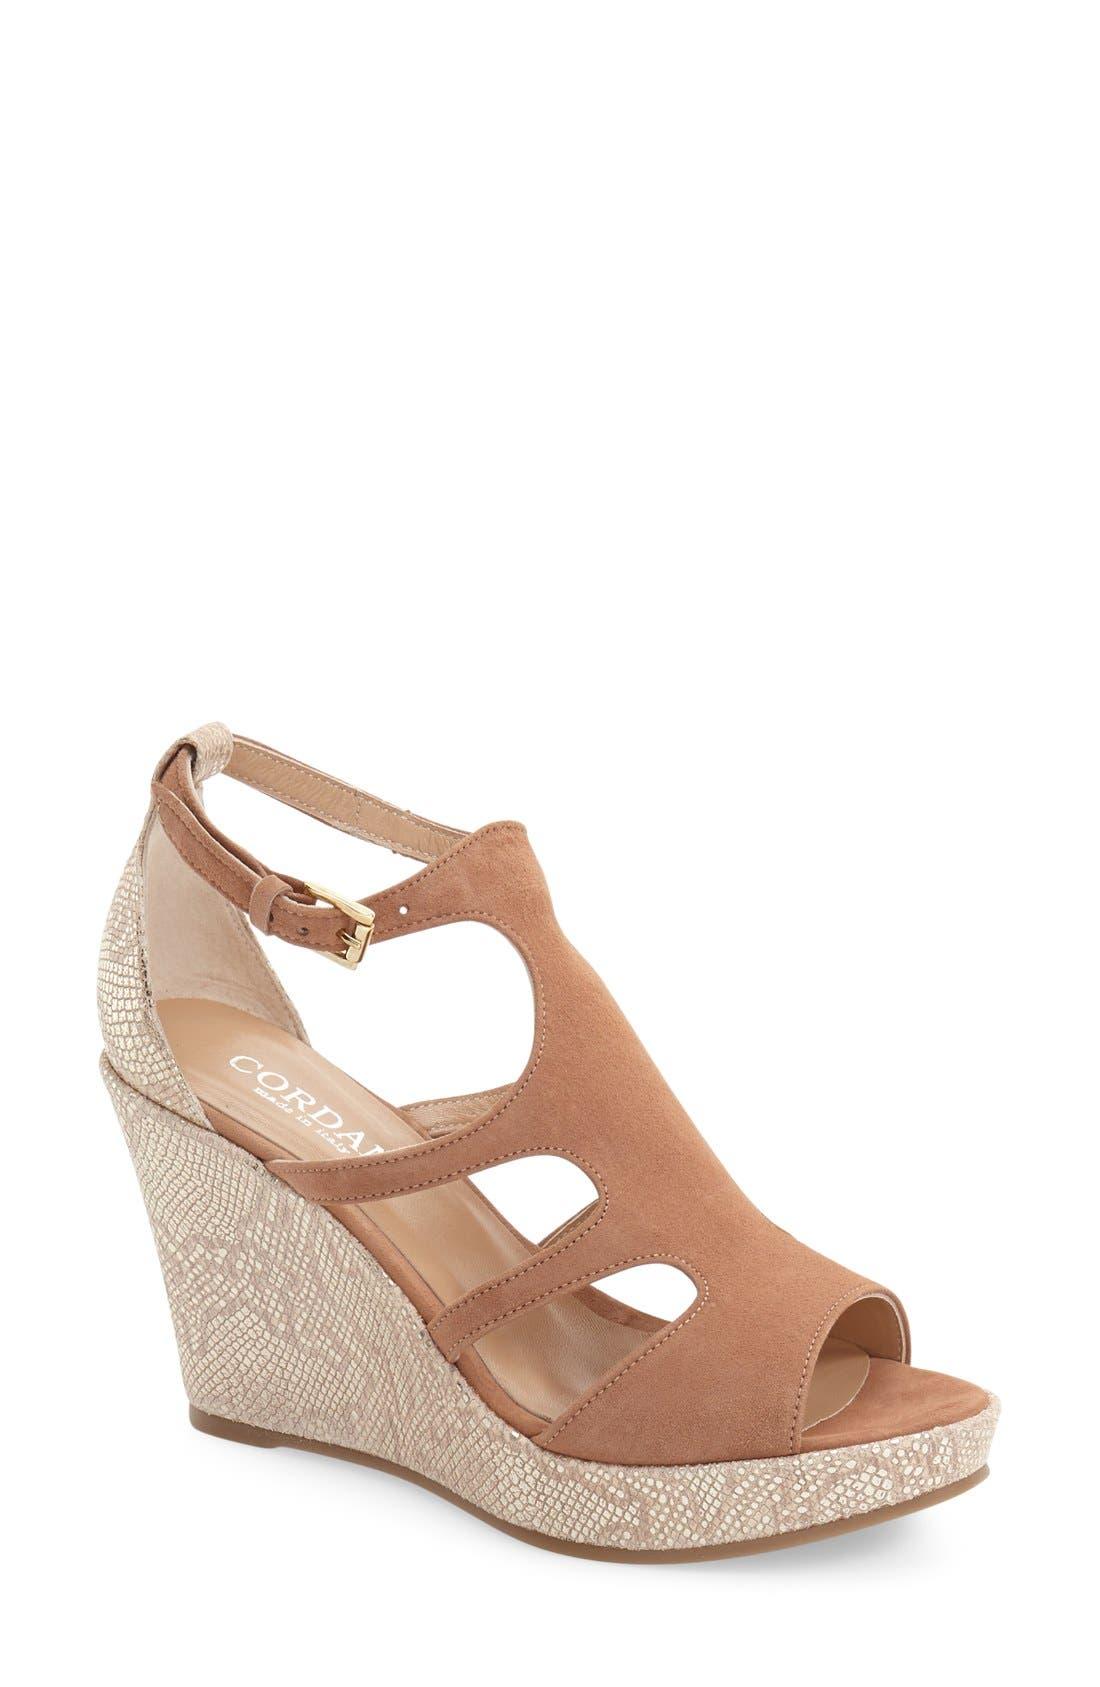 Main Image - Cordani 'Lennix' Platform Wedge Sandal (Women)